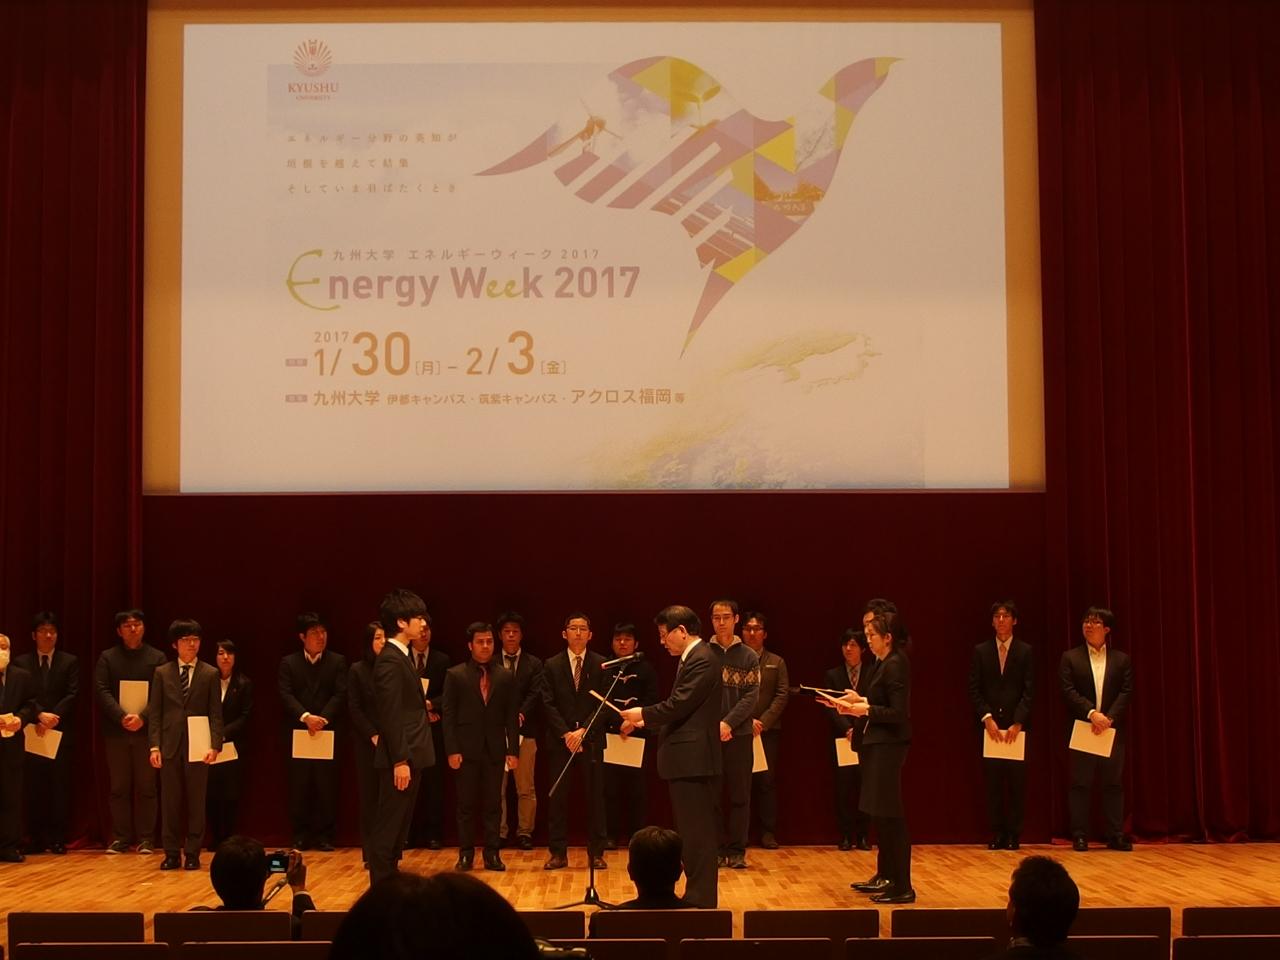 Takamura (D1/Department of Hydoroen Energy Systems) won Silver Prize in Kyushu University Energy Week 2017.